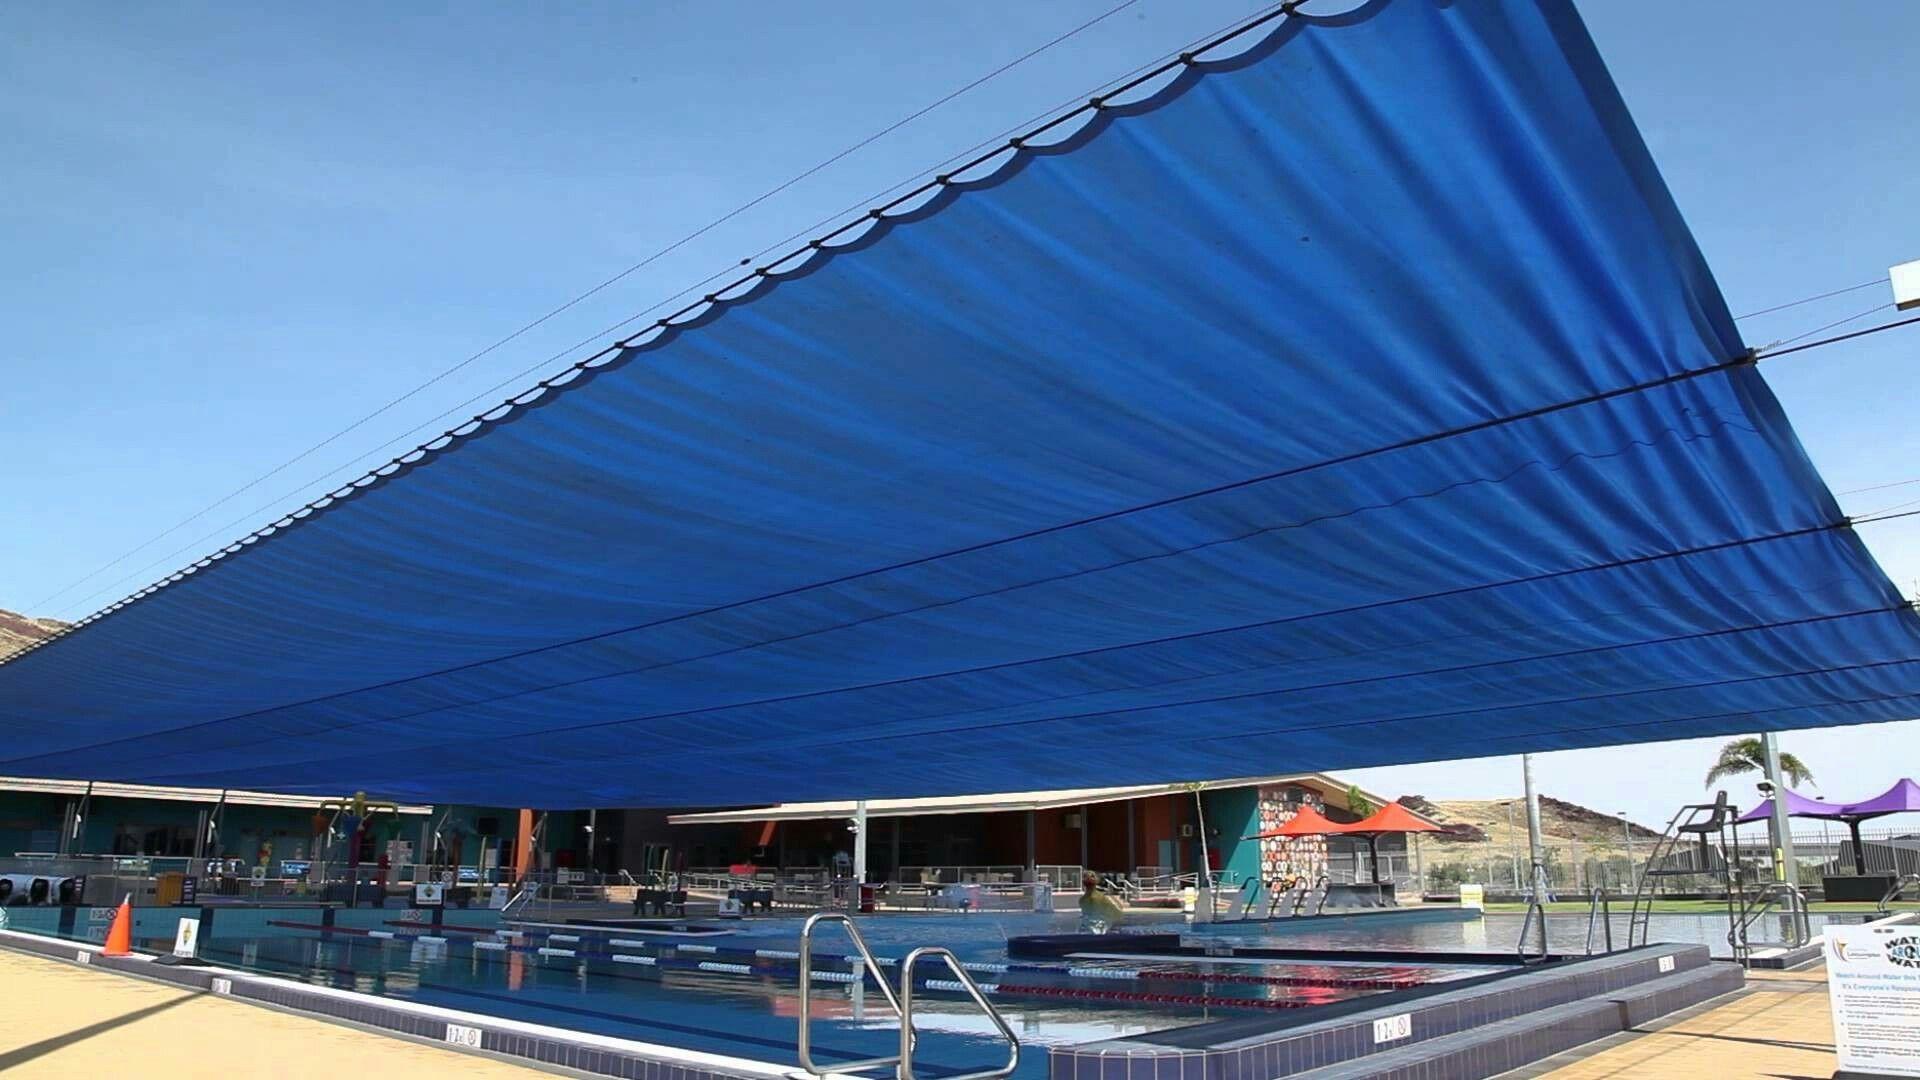 Pool Shade Pool Shade Retractable Shade Pergola With Roof